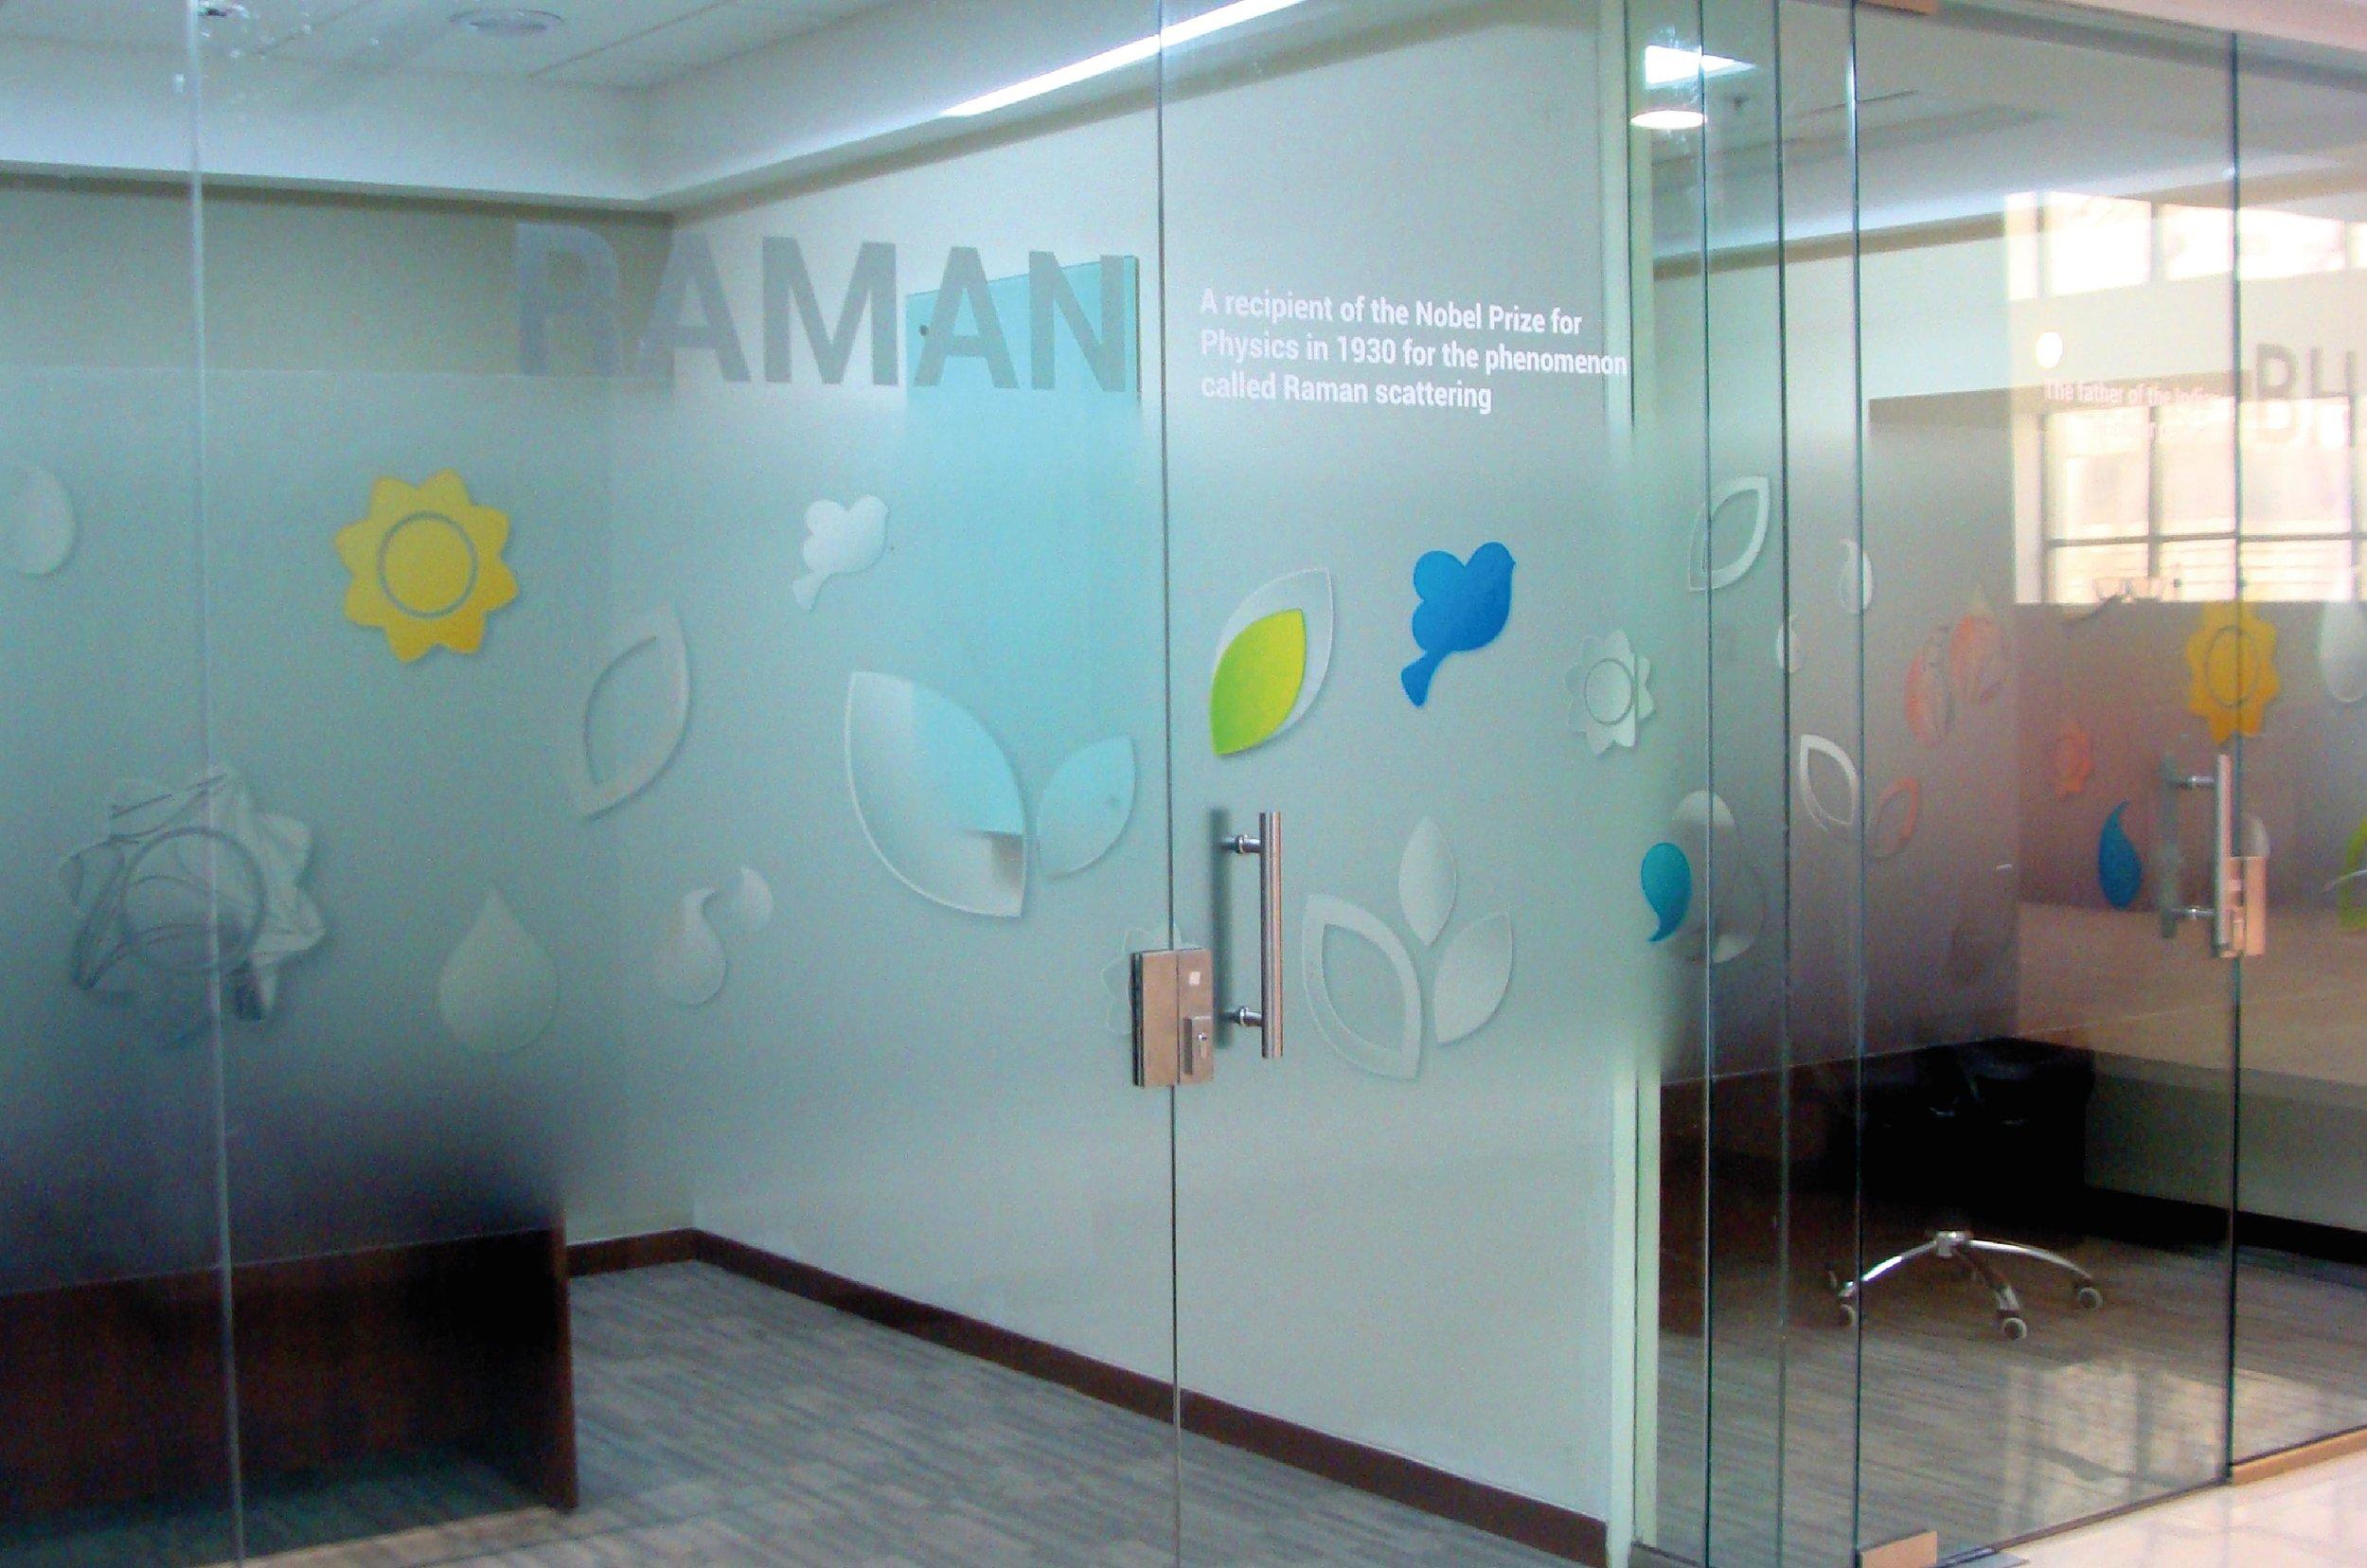 Praj Corporate Office_Branded Spaces_Elephant Design_8.jpg